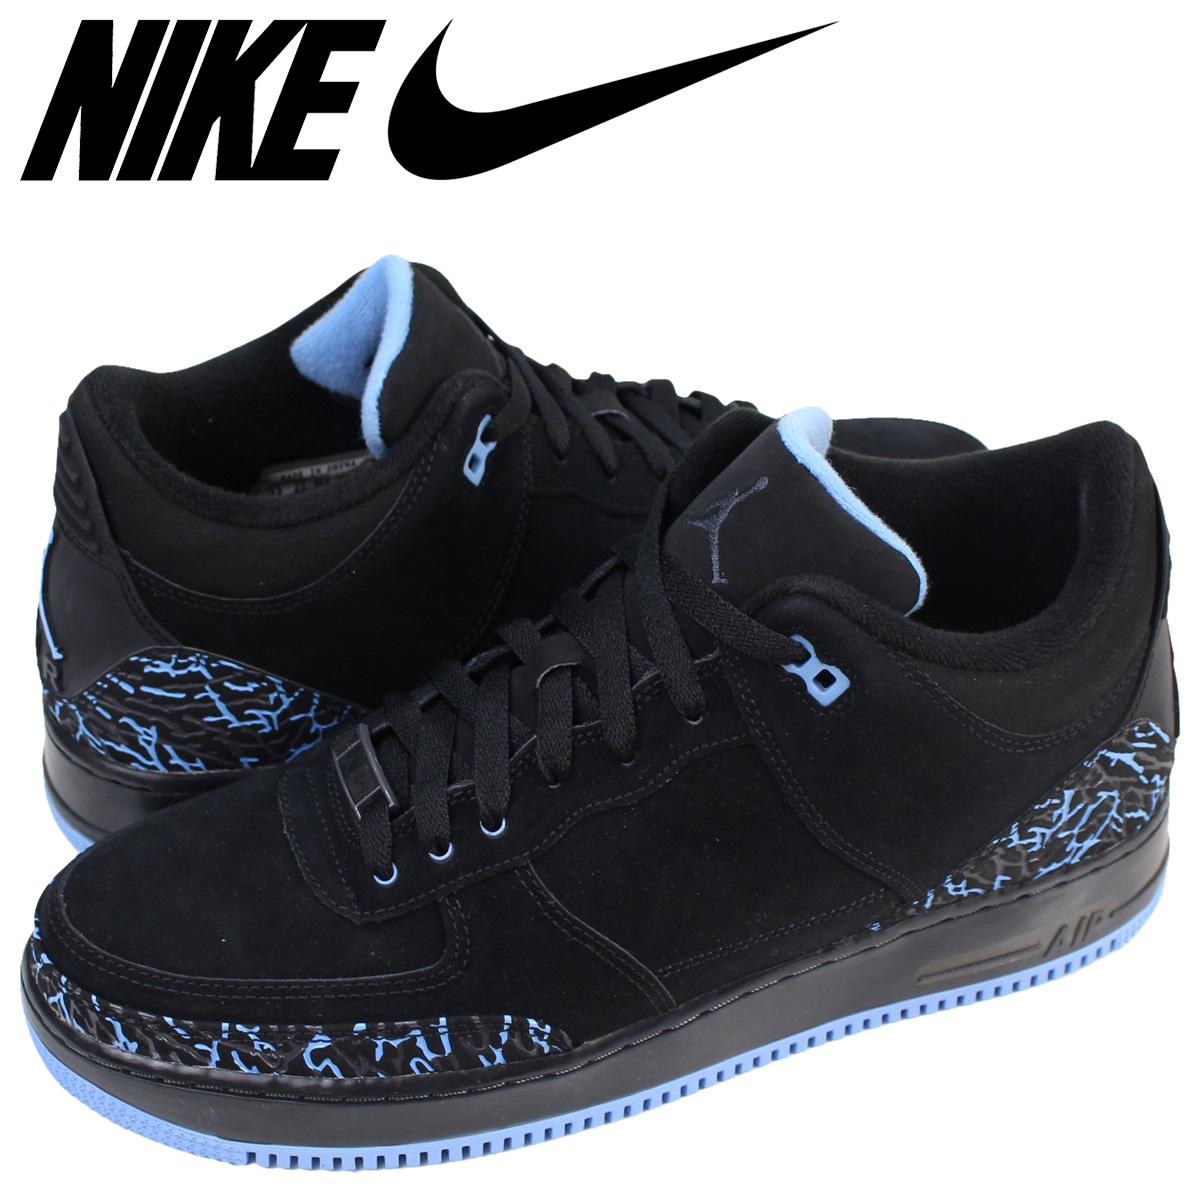 san francisco 08ebf 5a0b6 Nike NIKE Air Jordan sneakers AIR JORDAN FUSION 3 PREMIERE fusion 3  323,626-041 men s shoes black